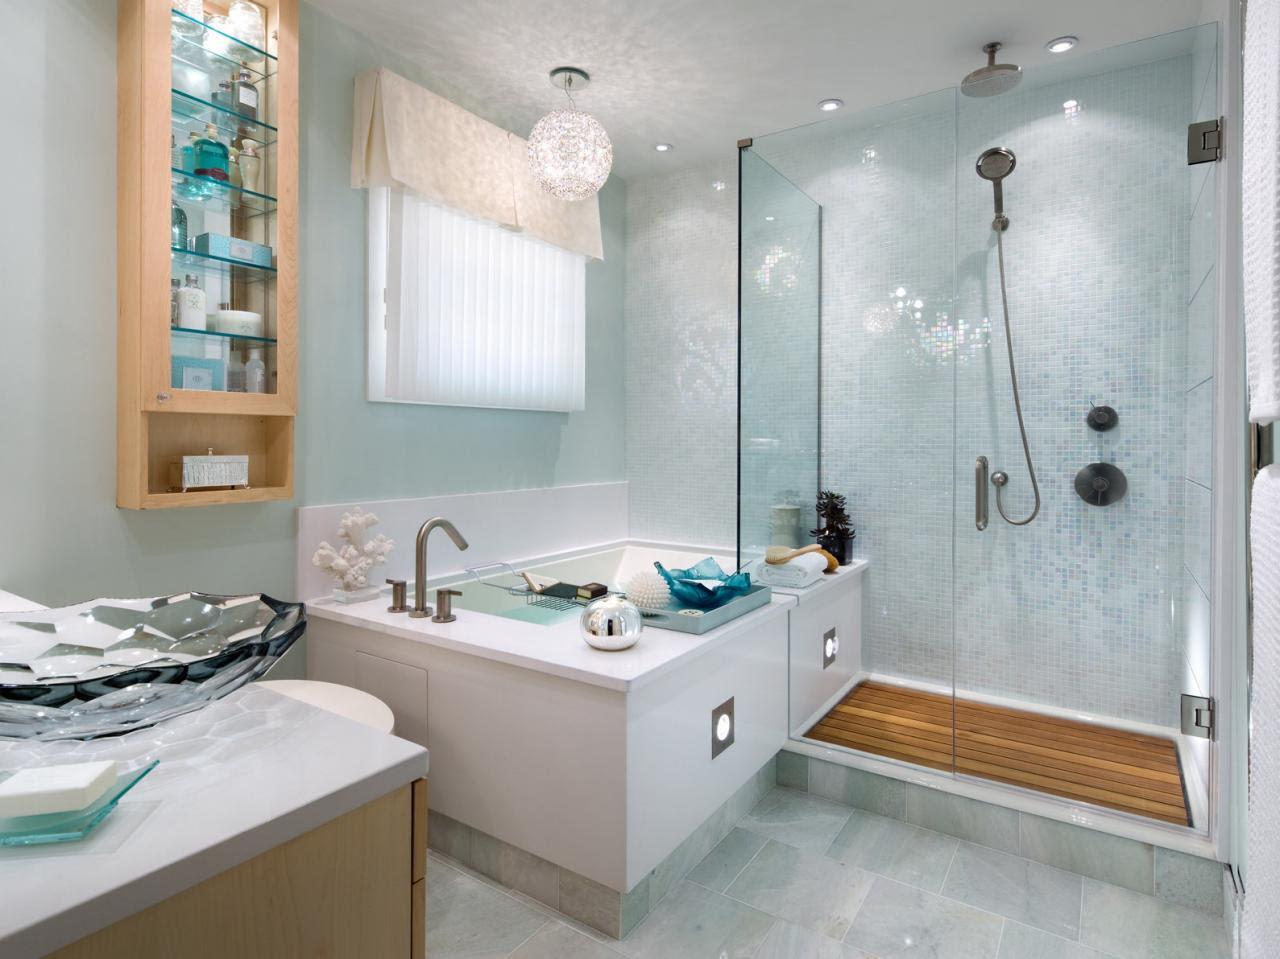 Corner Bathtub Design Ideas: Pictures & Tips From HGTV   HGTV